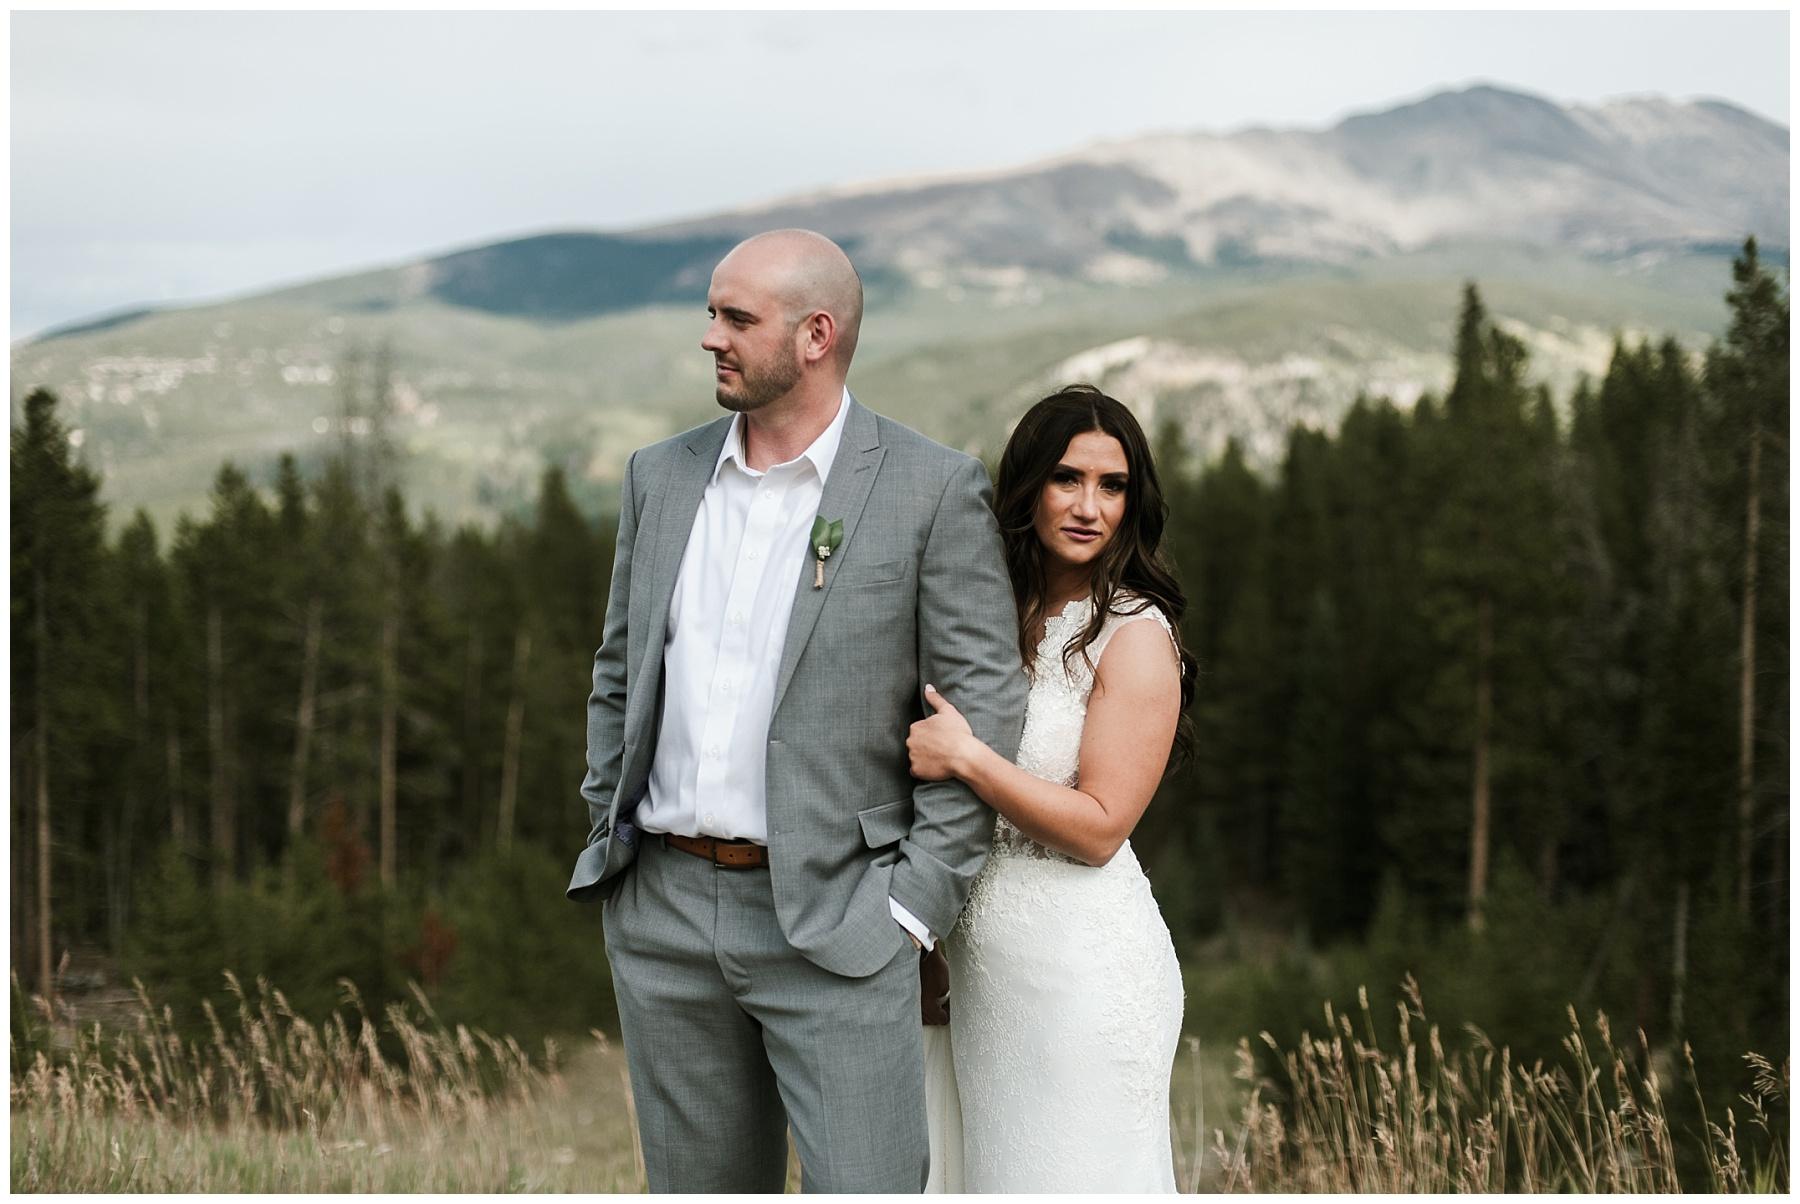 Katesalleyphotography-226_married in Breckenridge.jpg